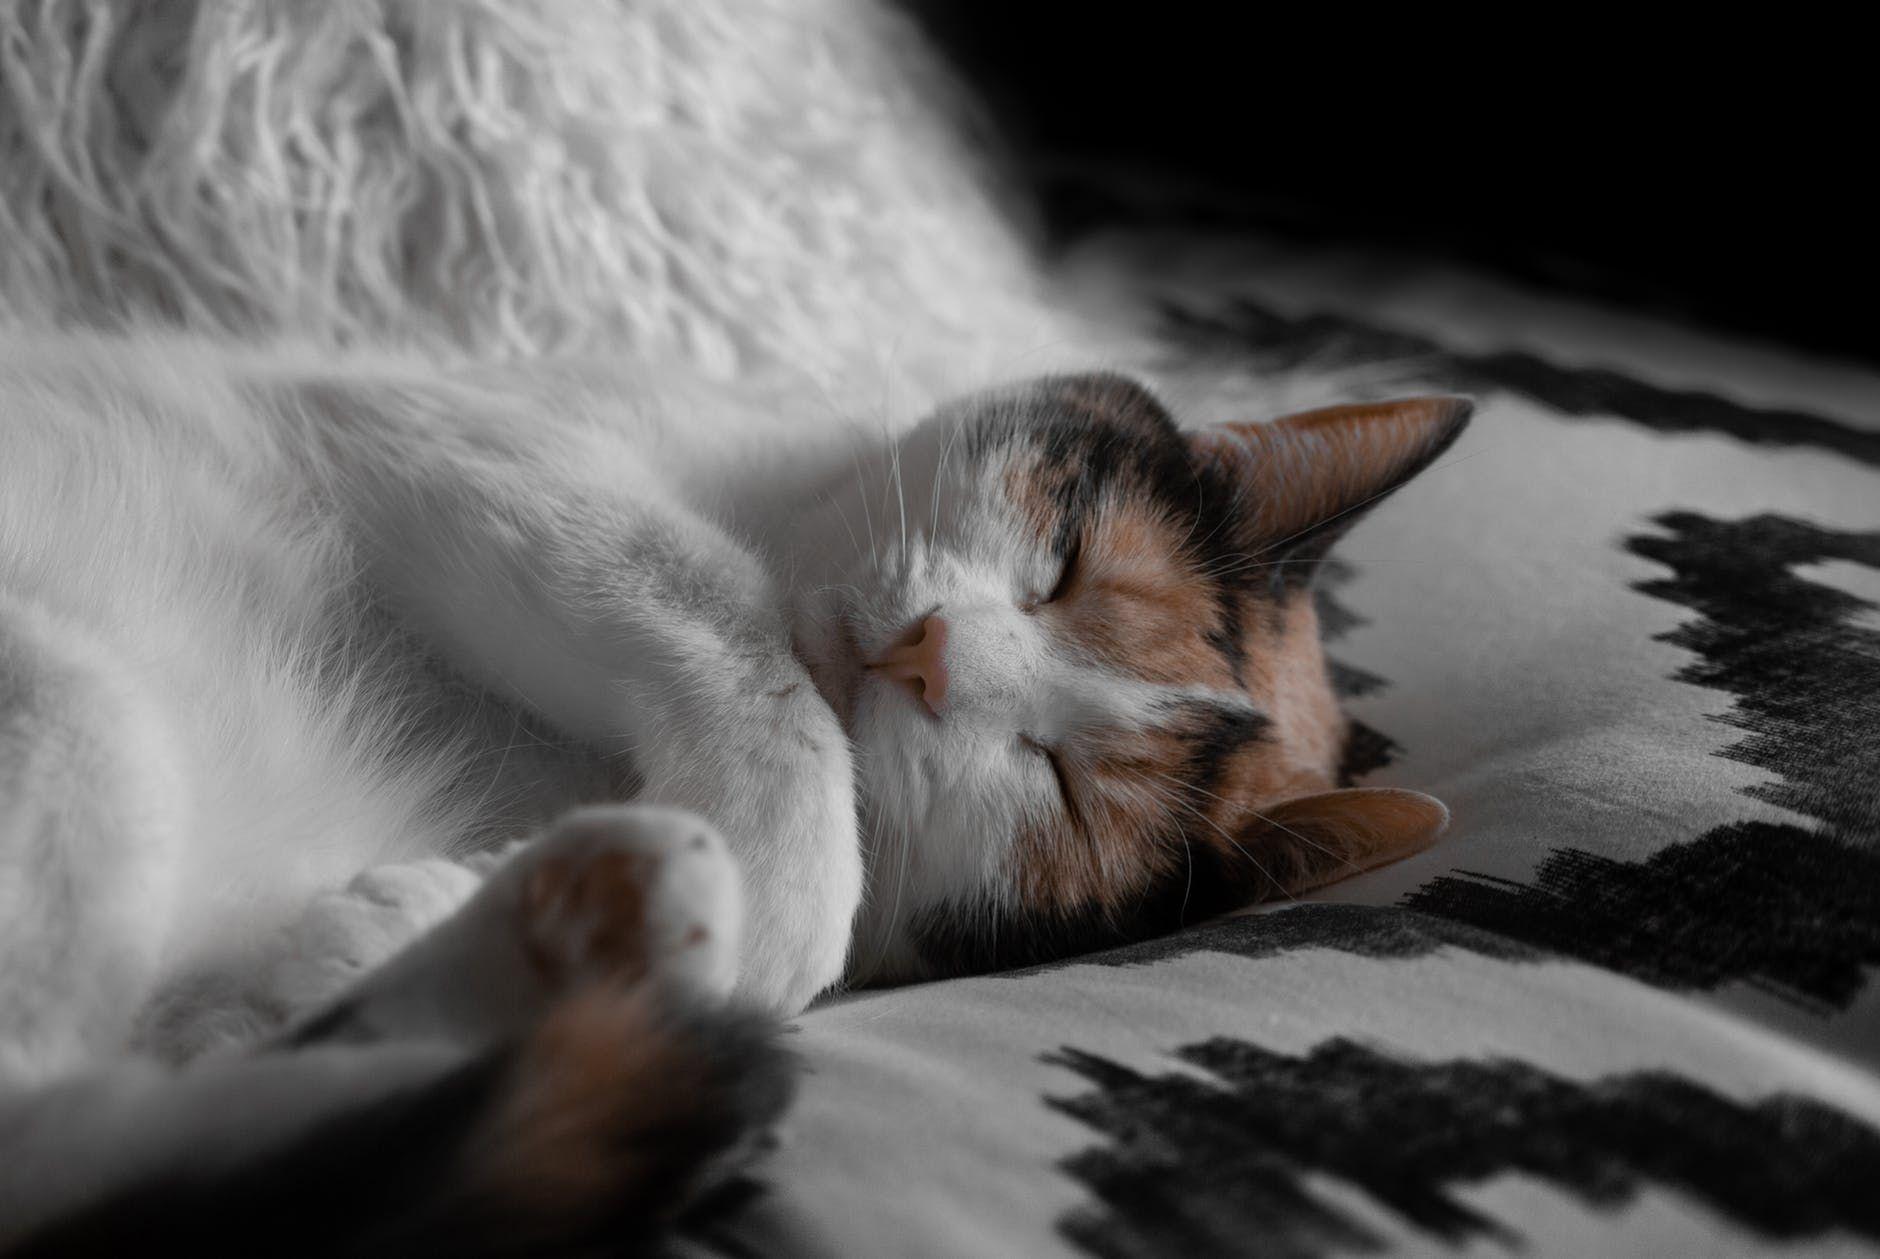 I Like this bed alot Soo soft & Fluffyhttps//i.redd.it